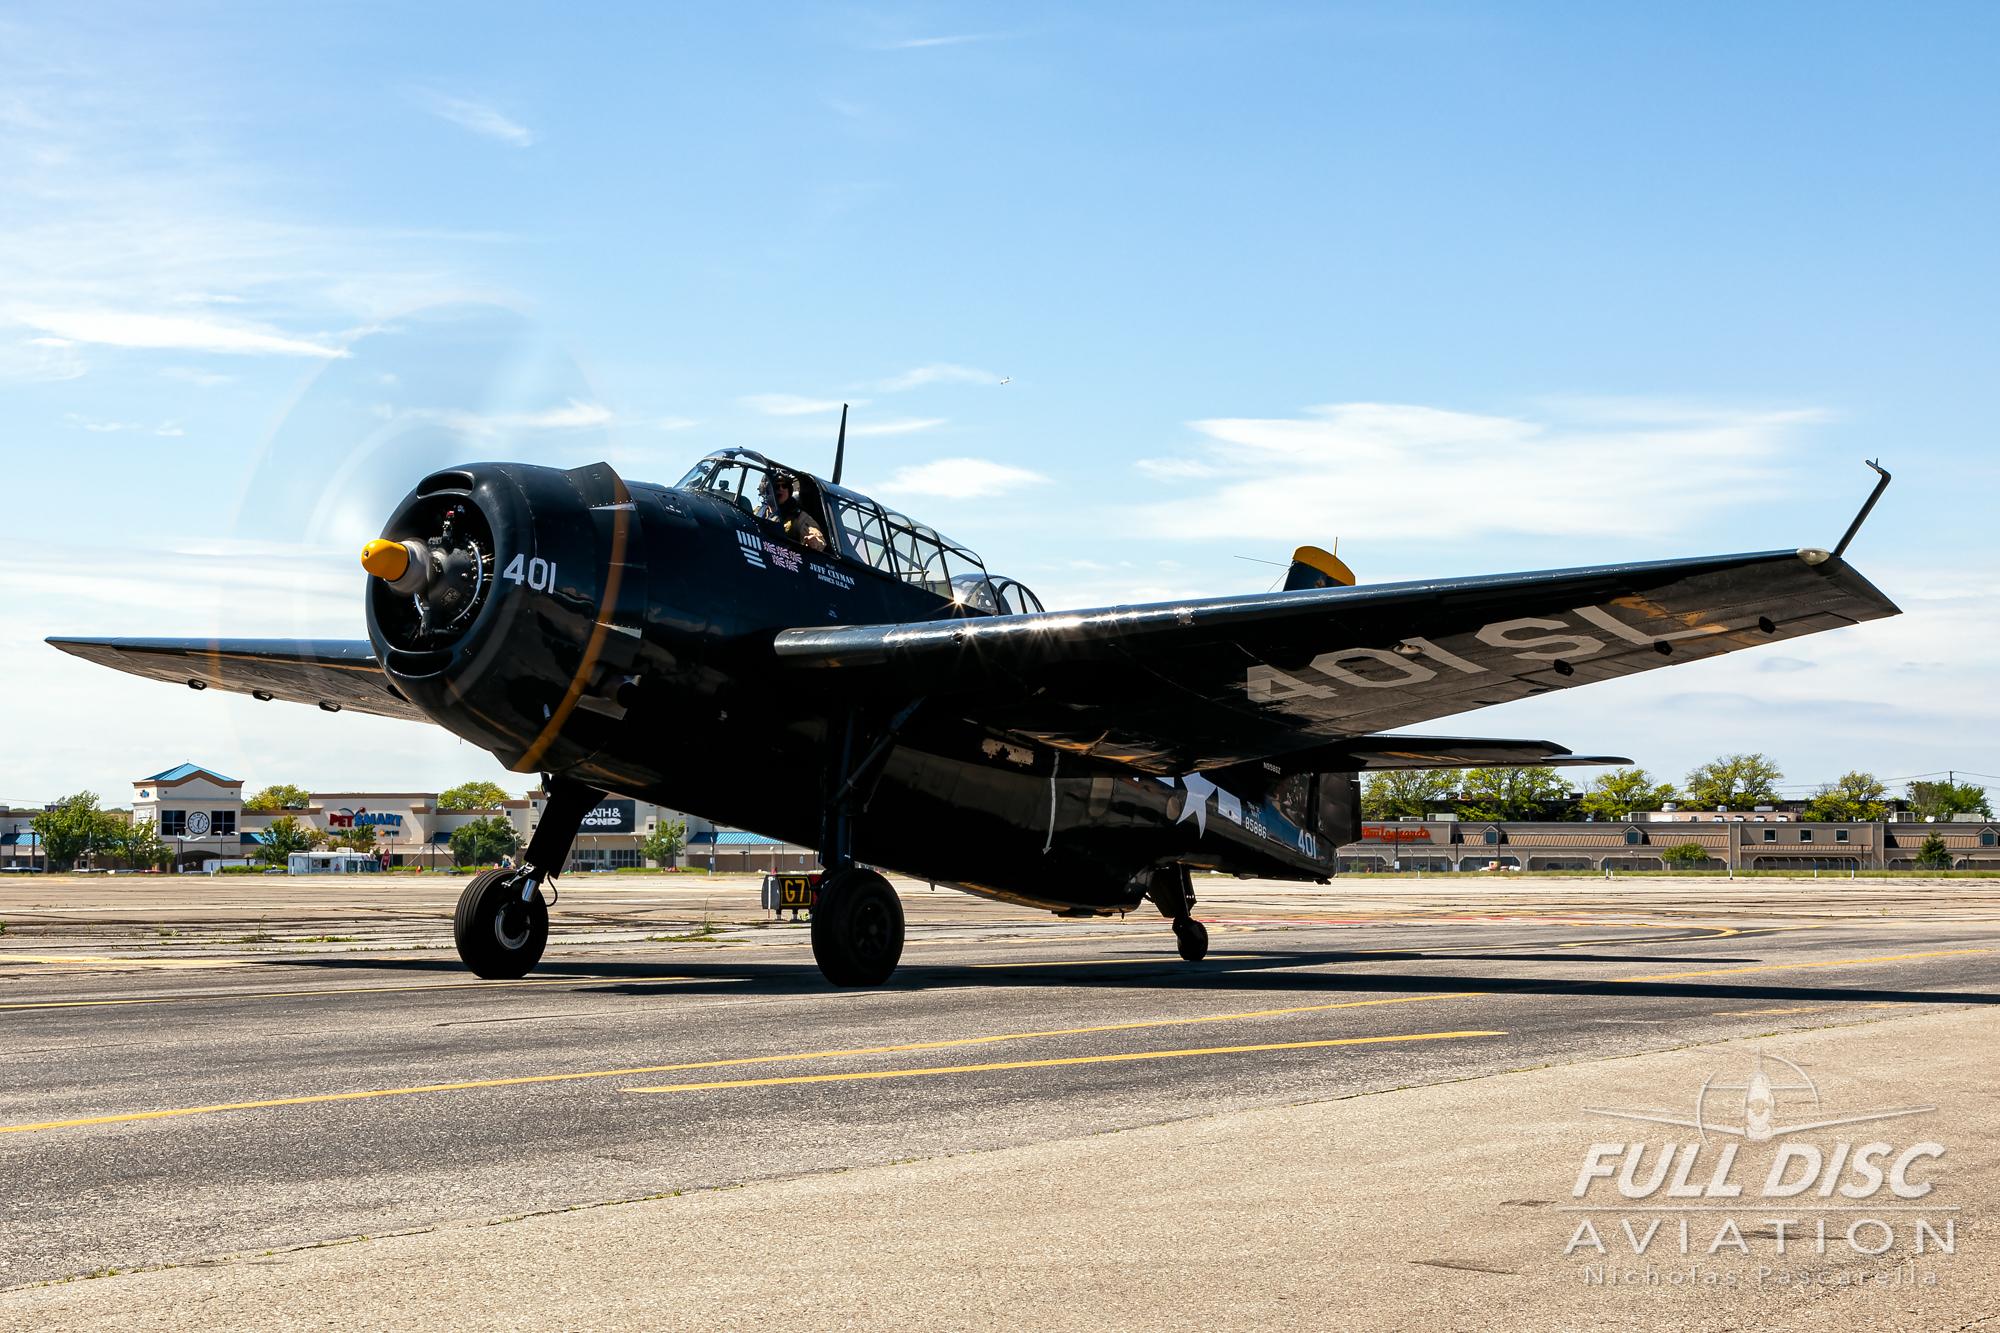 americanairpowermuseum_nicholaspascarella_nickpascarella_fulldiscaviation_legendsofairpower2019_aviation_warbird_tbmavenger_taxi_torpedobomber.jpg